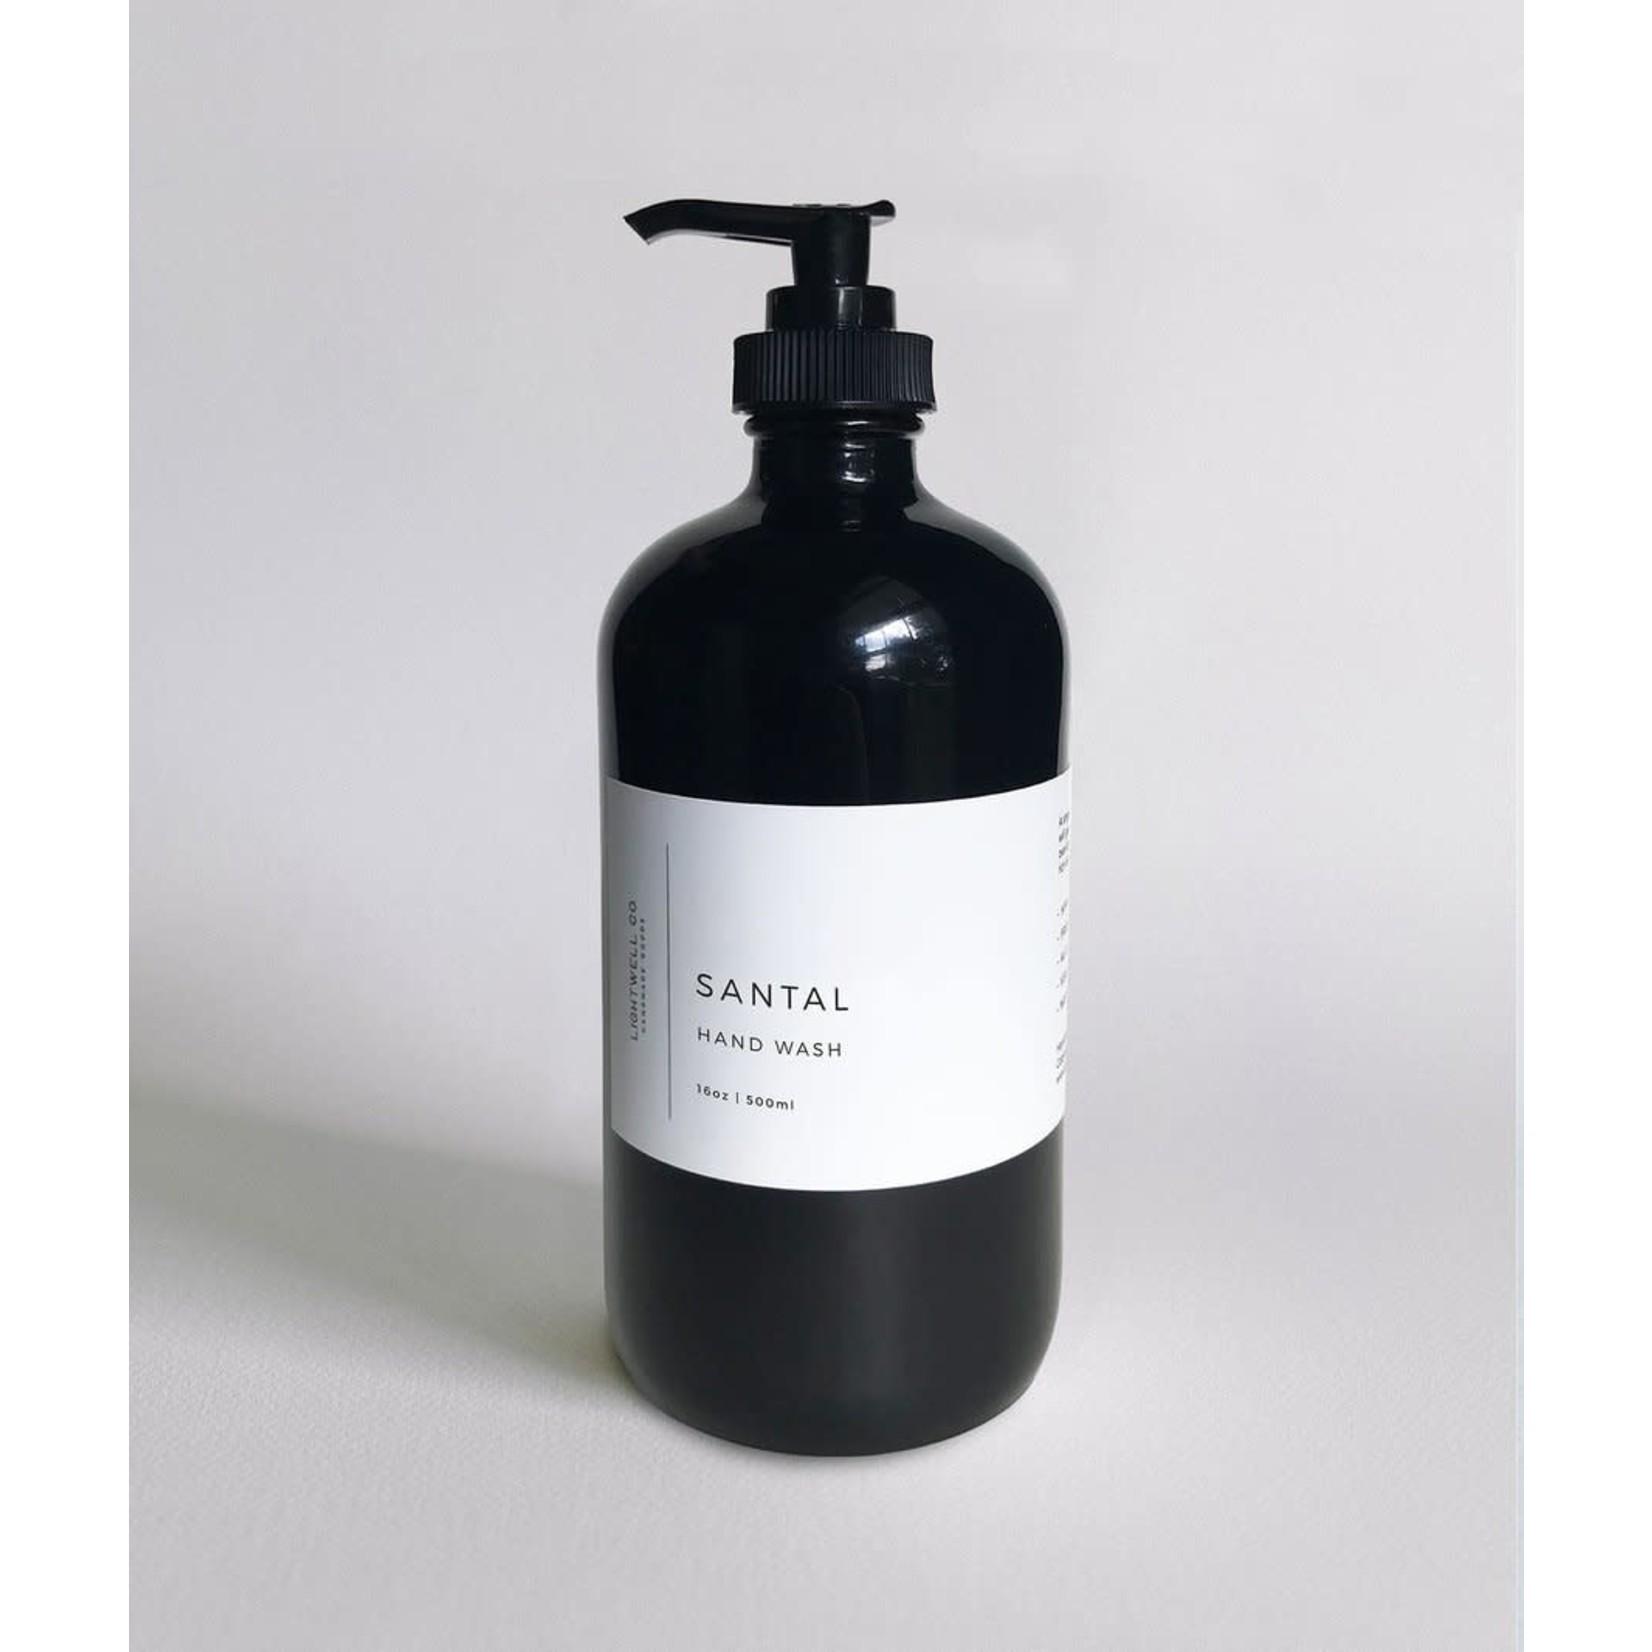 Lightwell Co. Santal Hand Wash